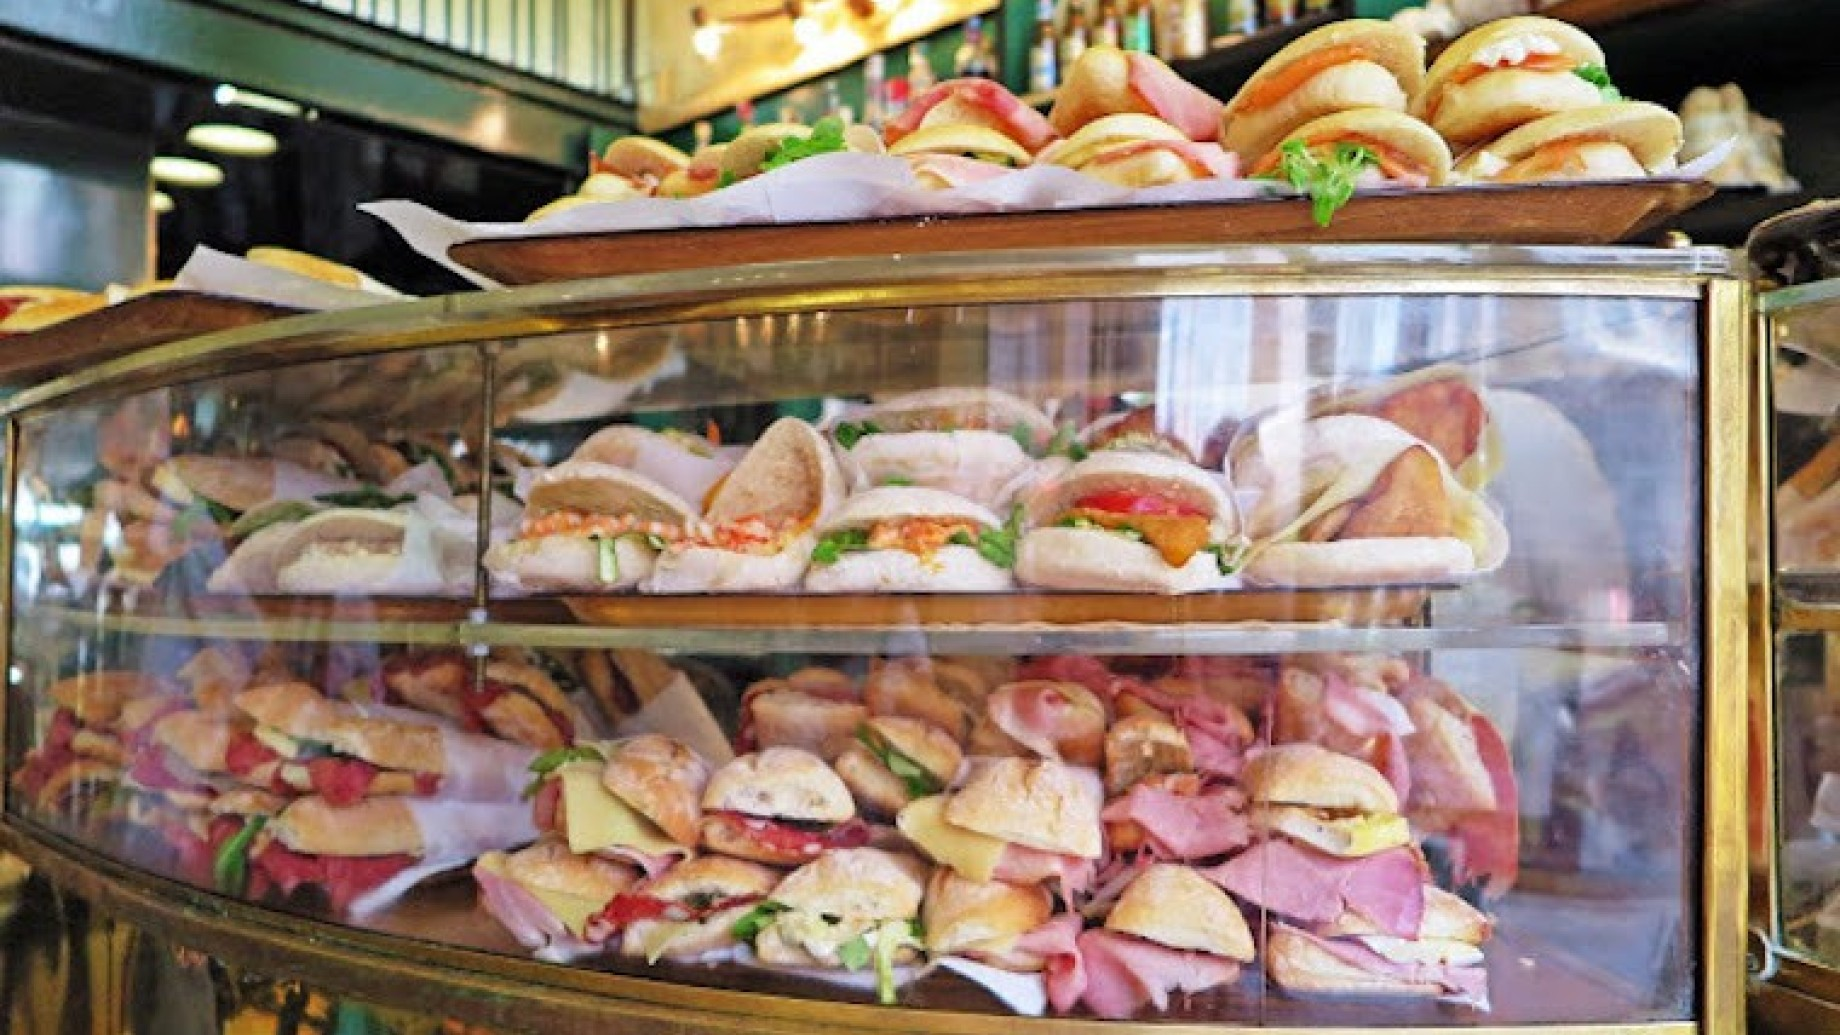 g.b-bar-sandwich-milan-italy